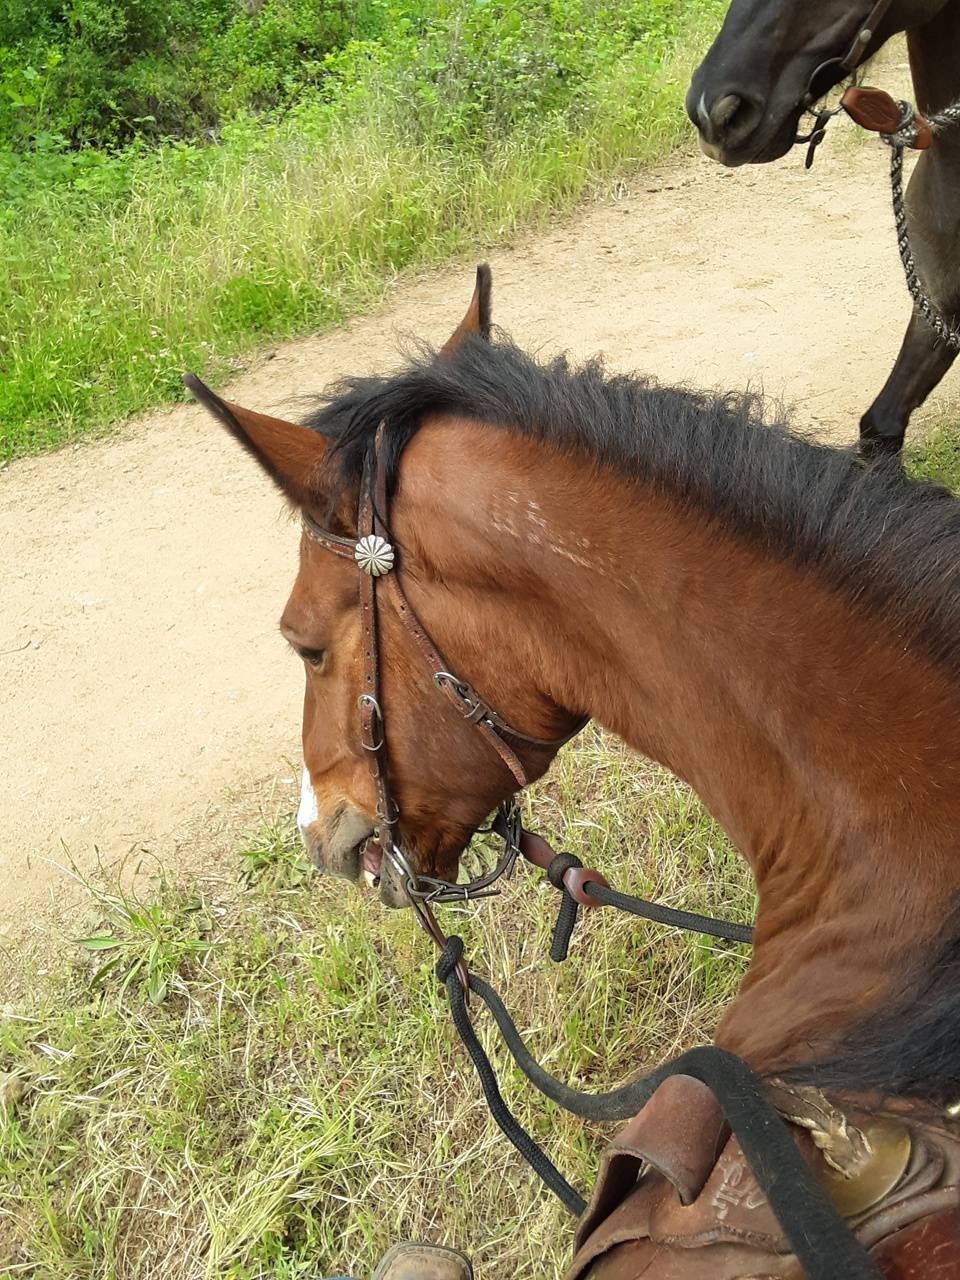 Love horses 4 ever